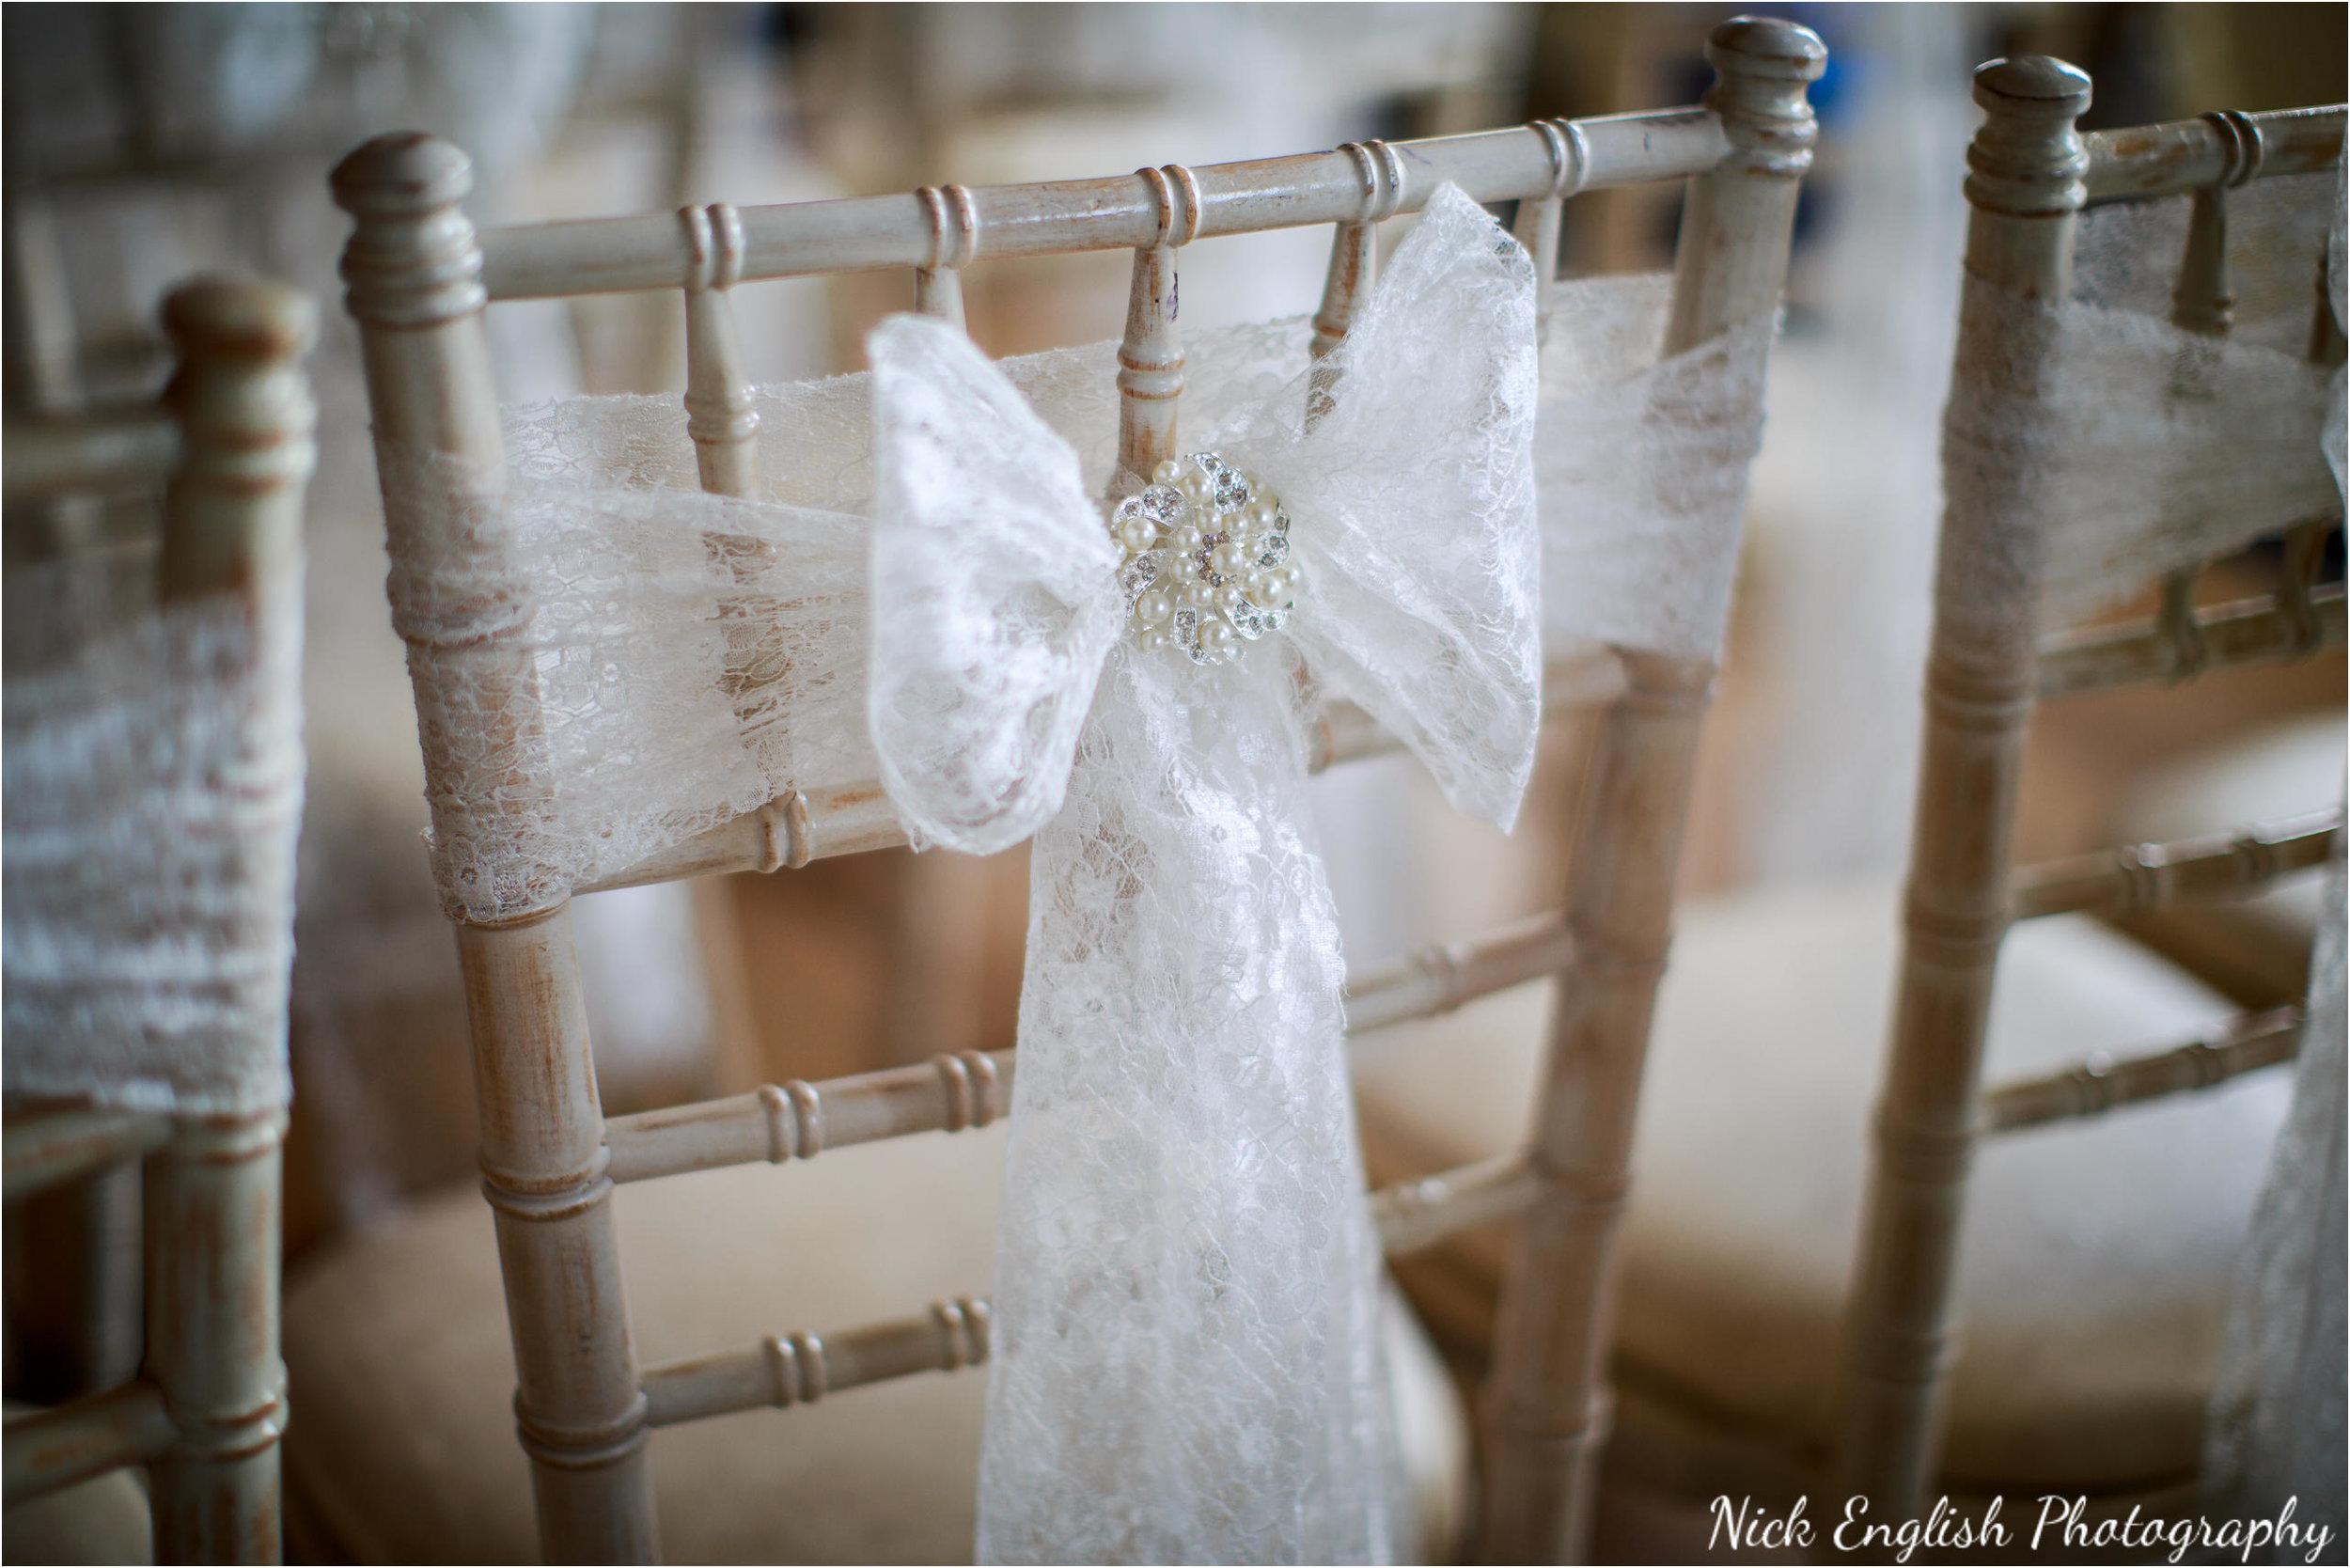 Alison James Wedding Photographs at Eaves Hall West Bradford 38jpg.jpeg